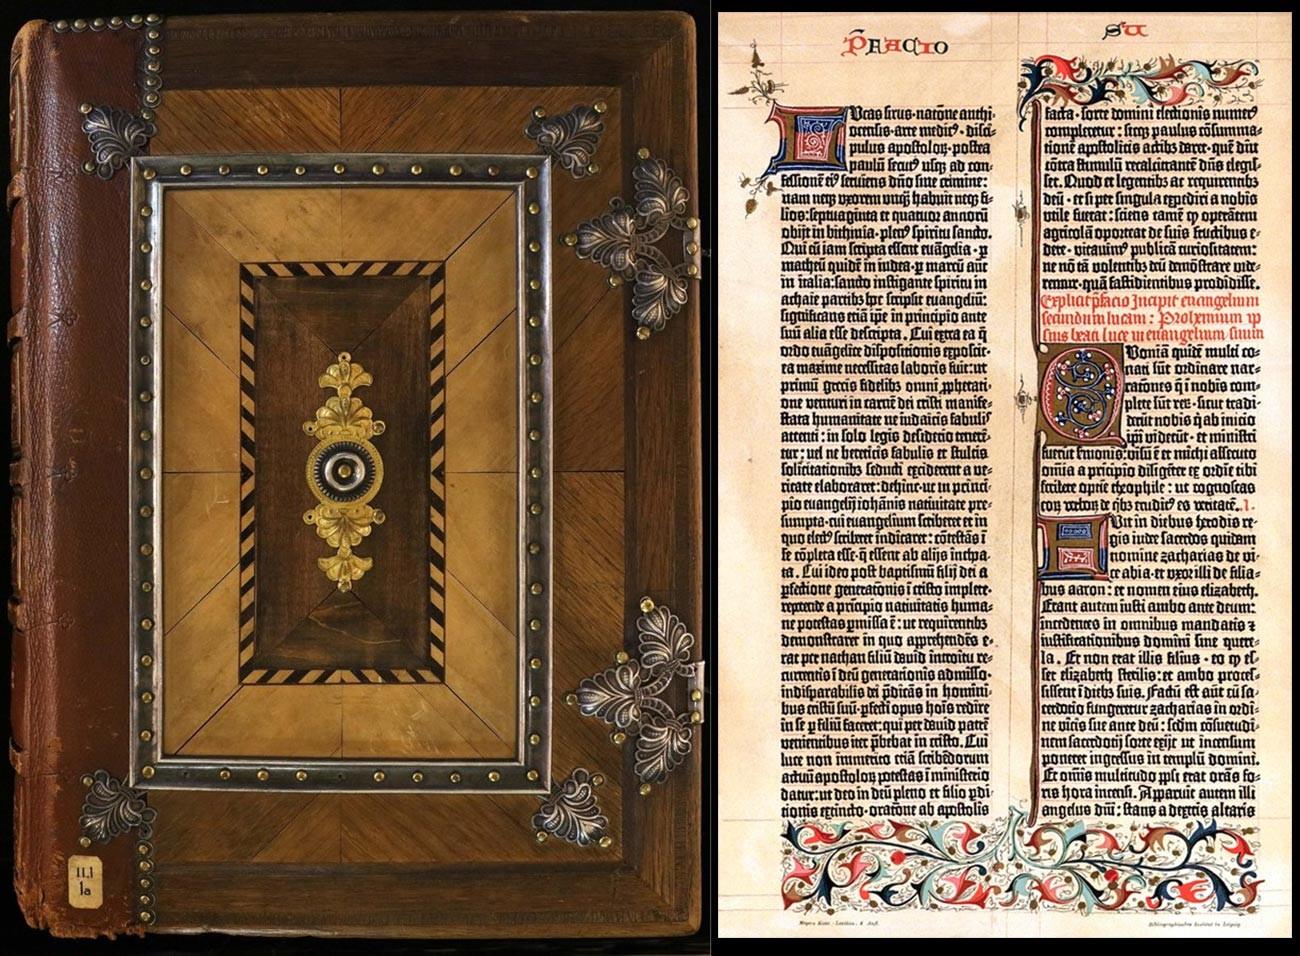 Bíblia de Gutenberg.